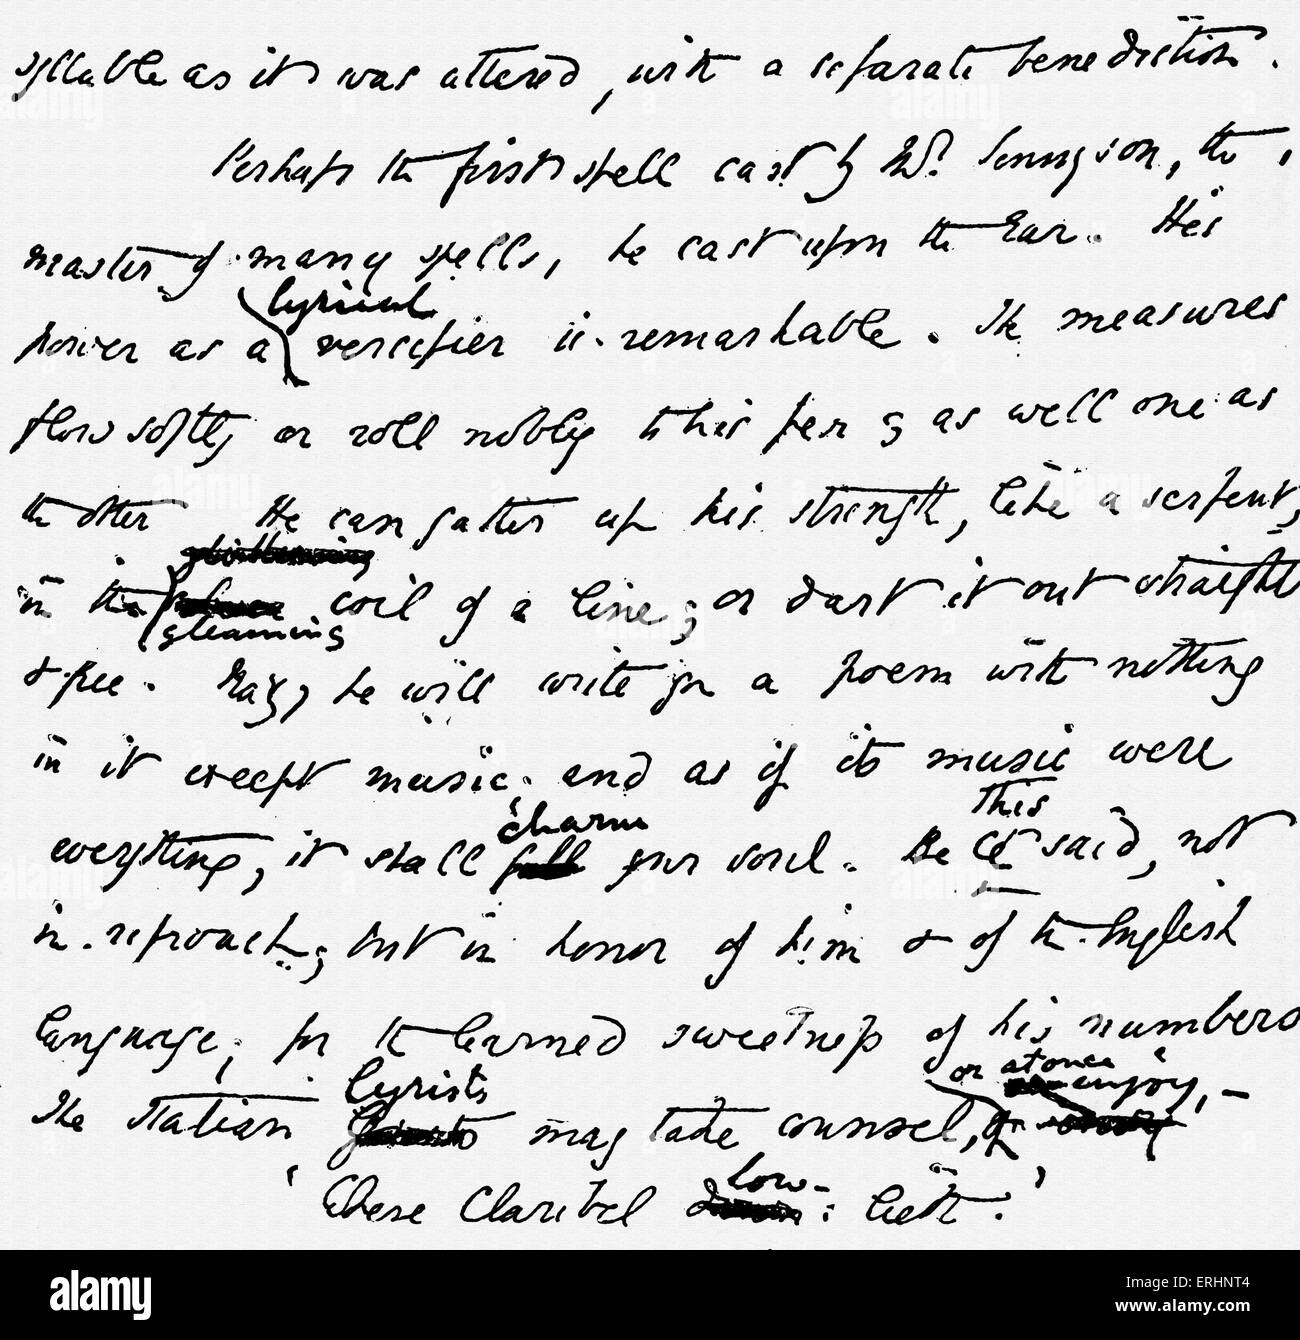 Elizabeth Barrett Browning 's manuscript. EBB helping Richard Henry Horne in preparing essays published in 1844. - Stock Image